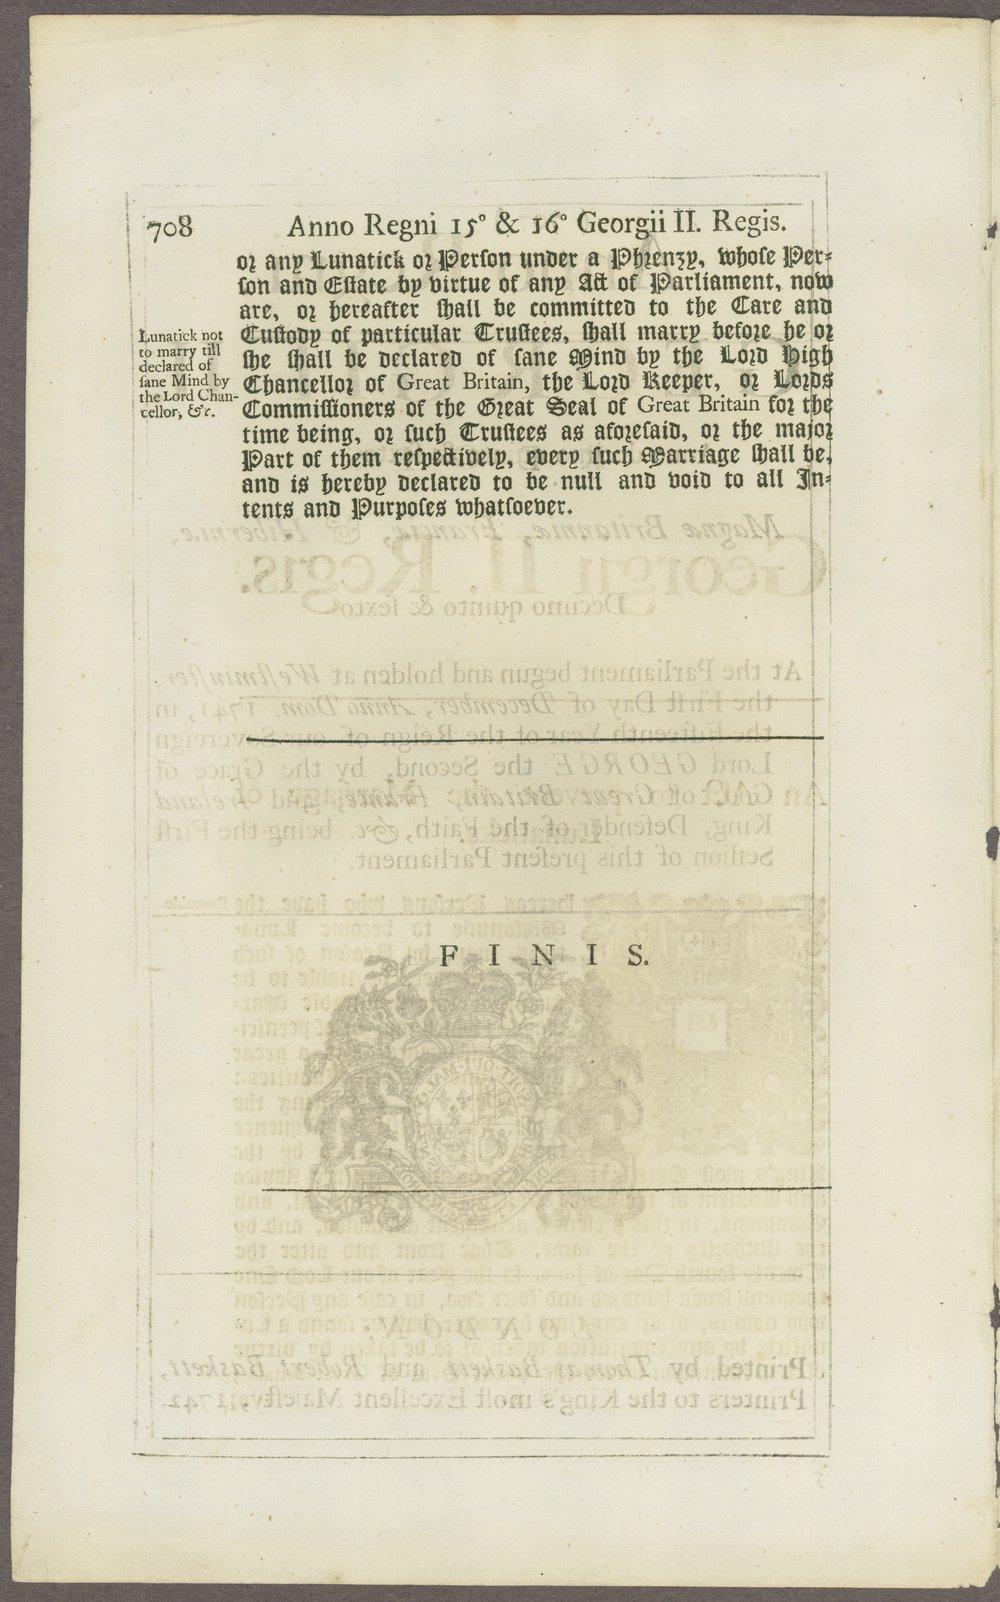 King George III materials - 3